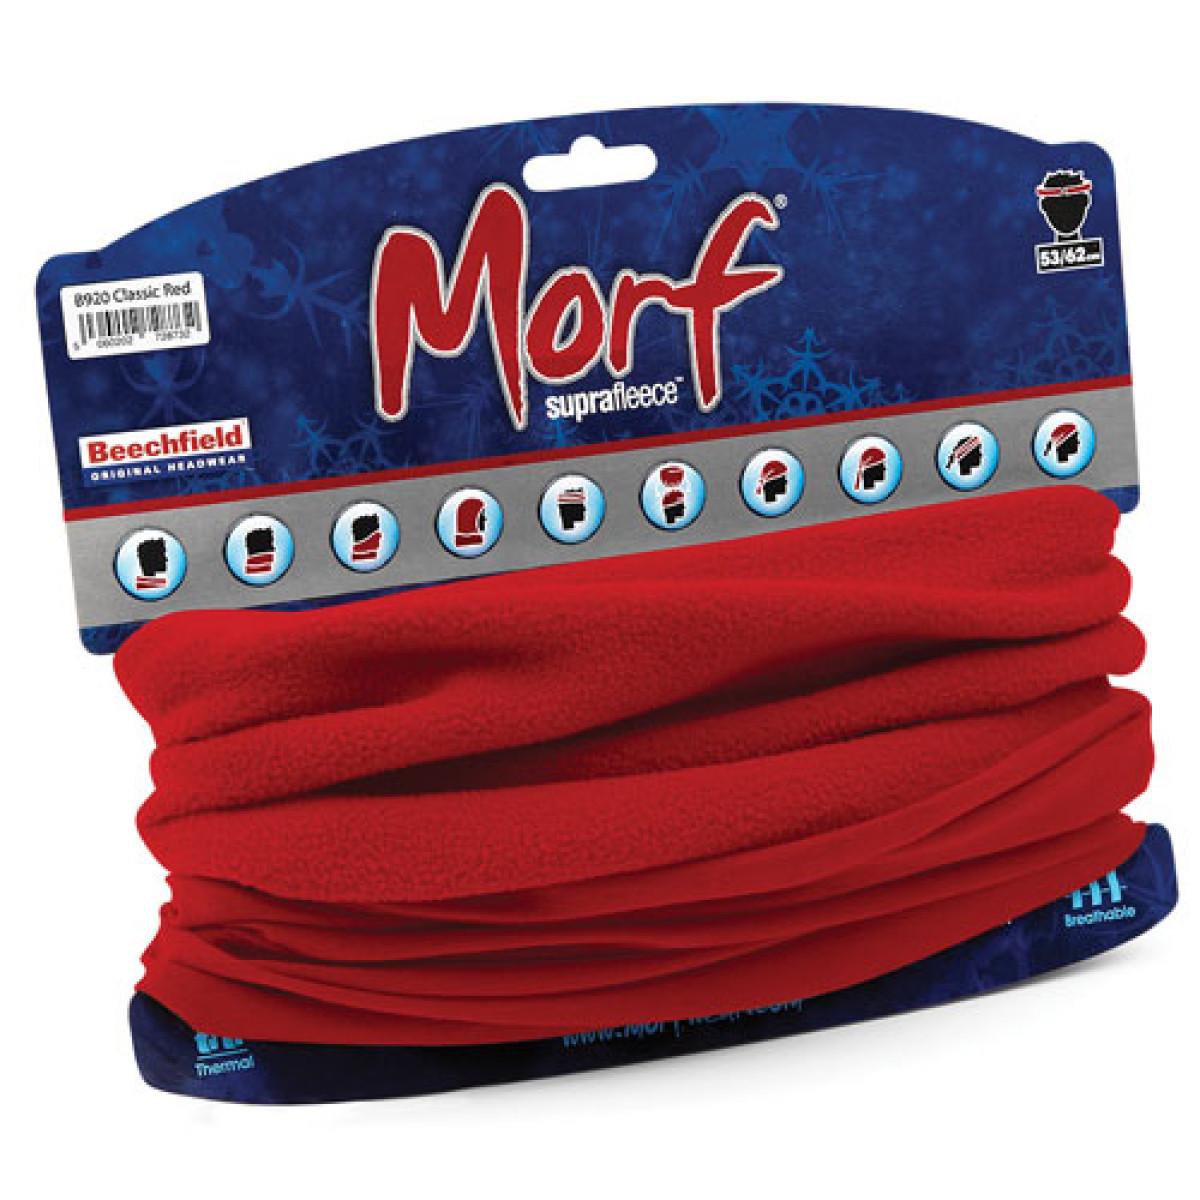 Beechfield Morf Superfleece